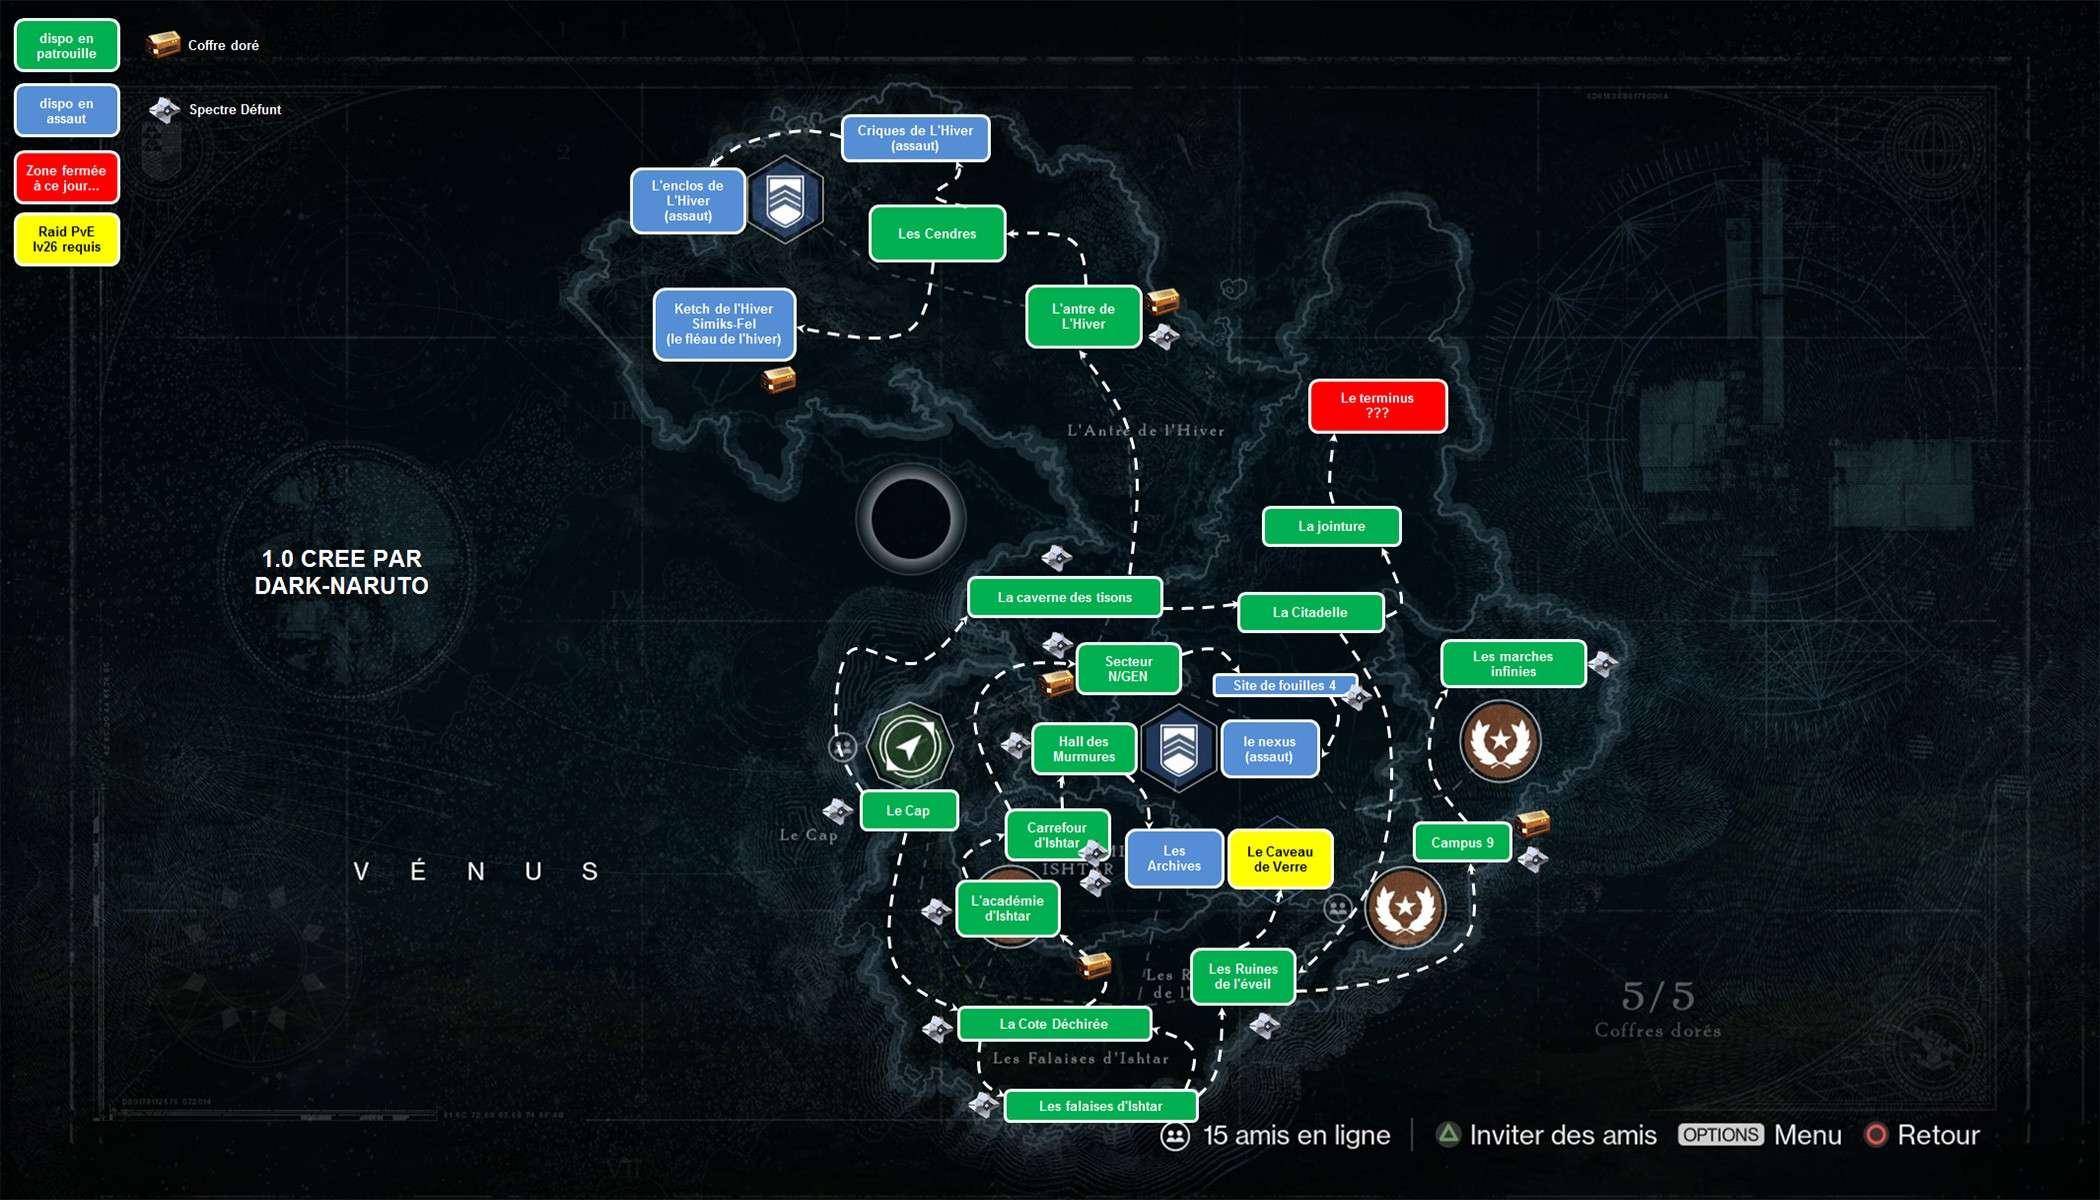 Pin destiny venus map on pinterest